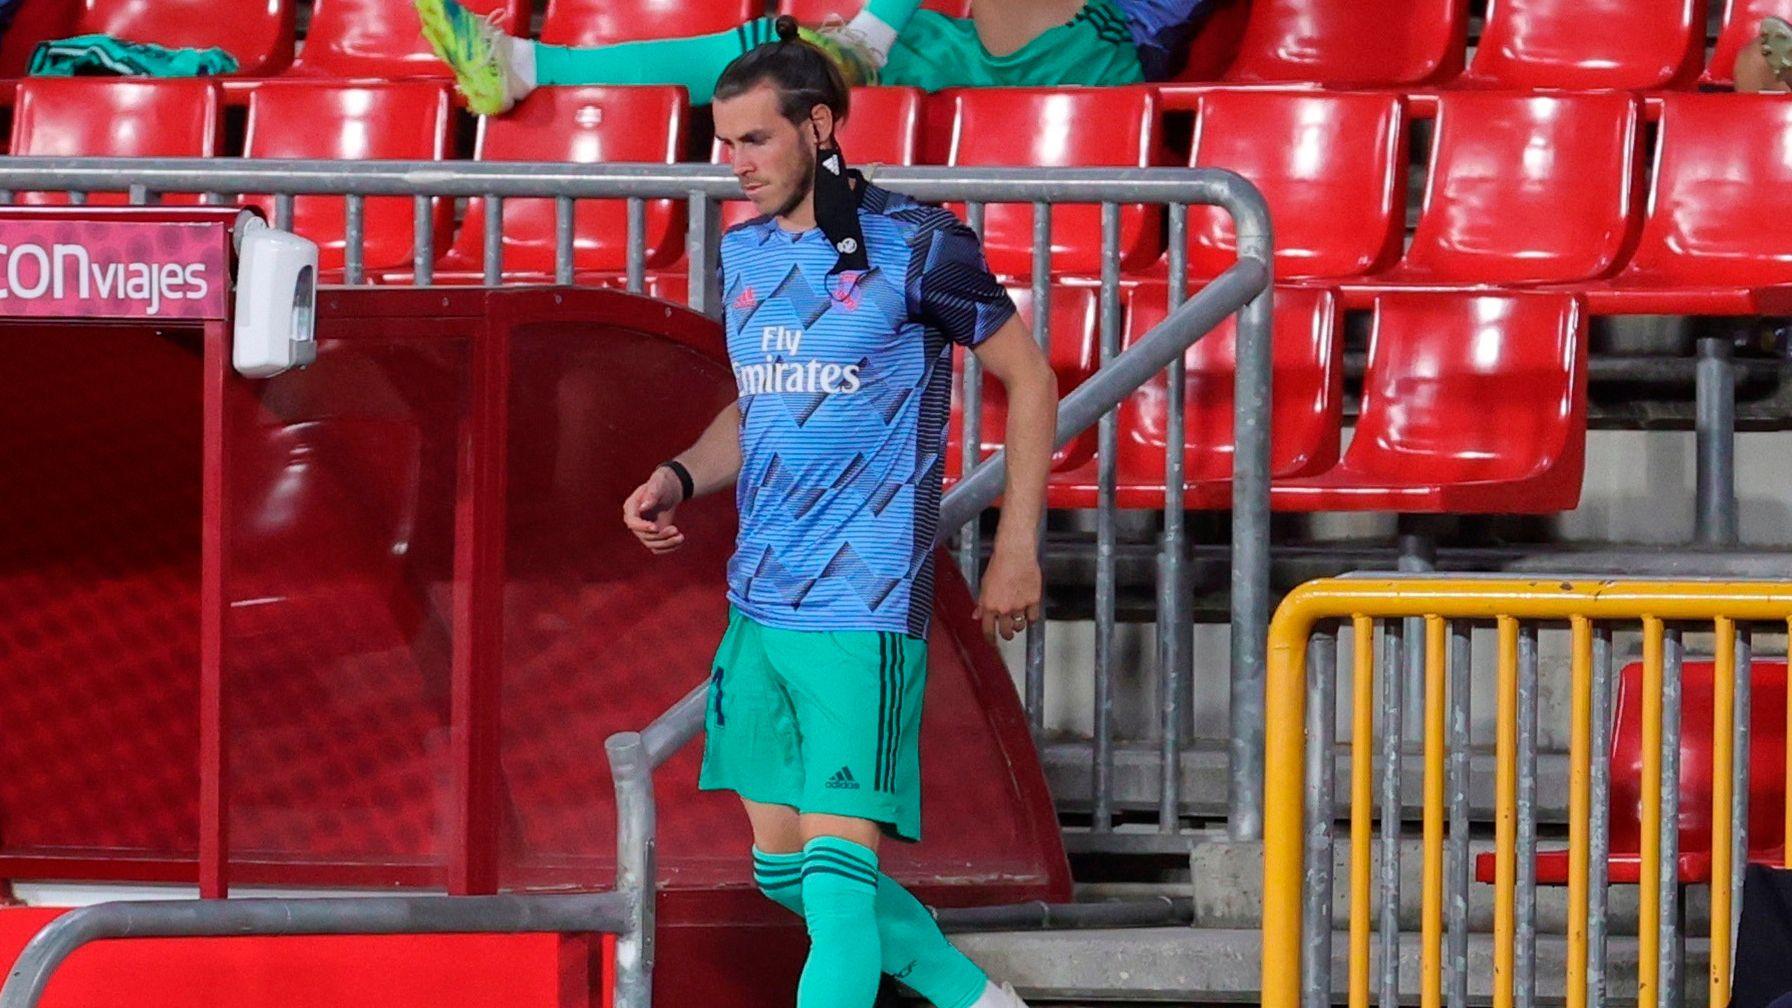 Real Madrid busca encontrarle una salida a Gareth Bale (EFE/JuanJo Mart)